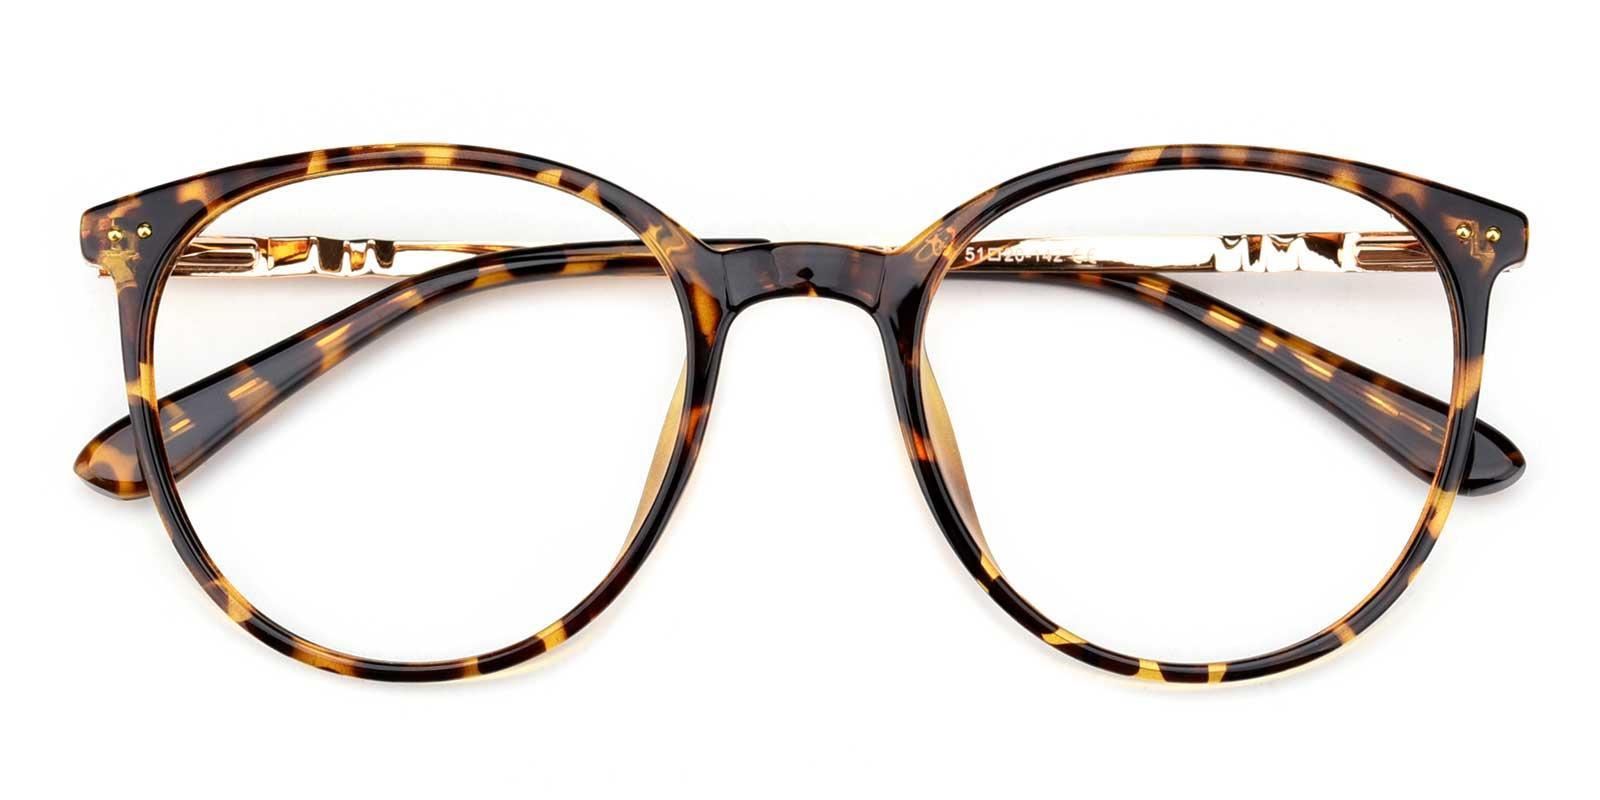 Peacock-Tortoise-Round-Acetate-Eyeglasses-detail